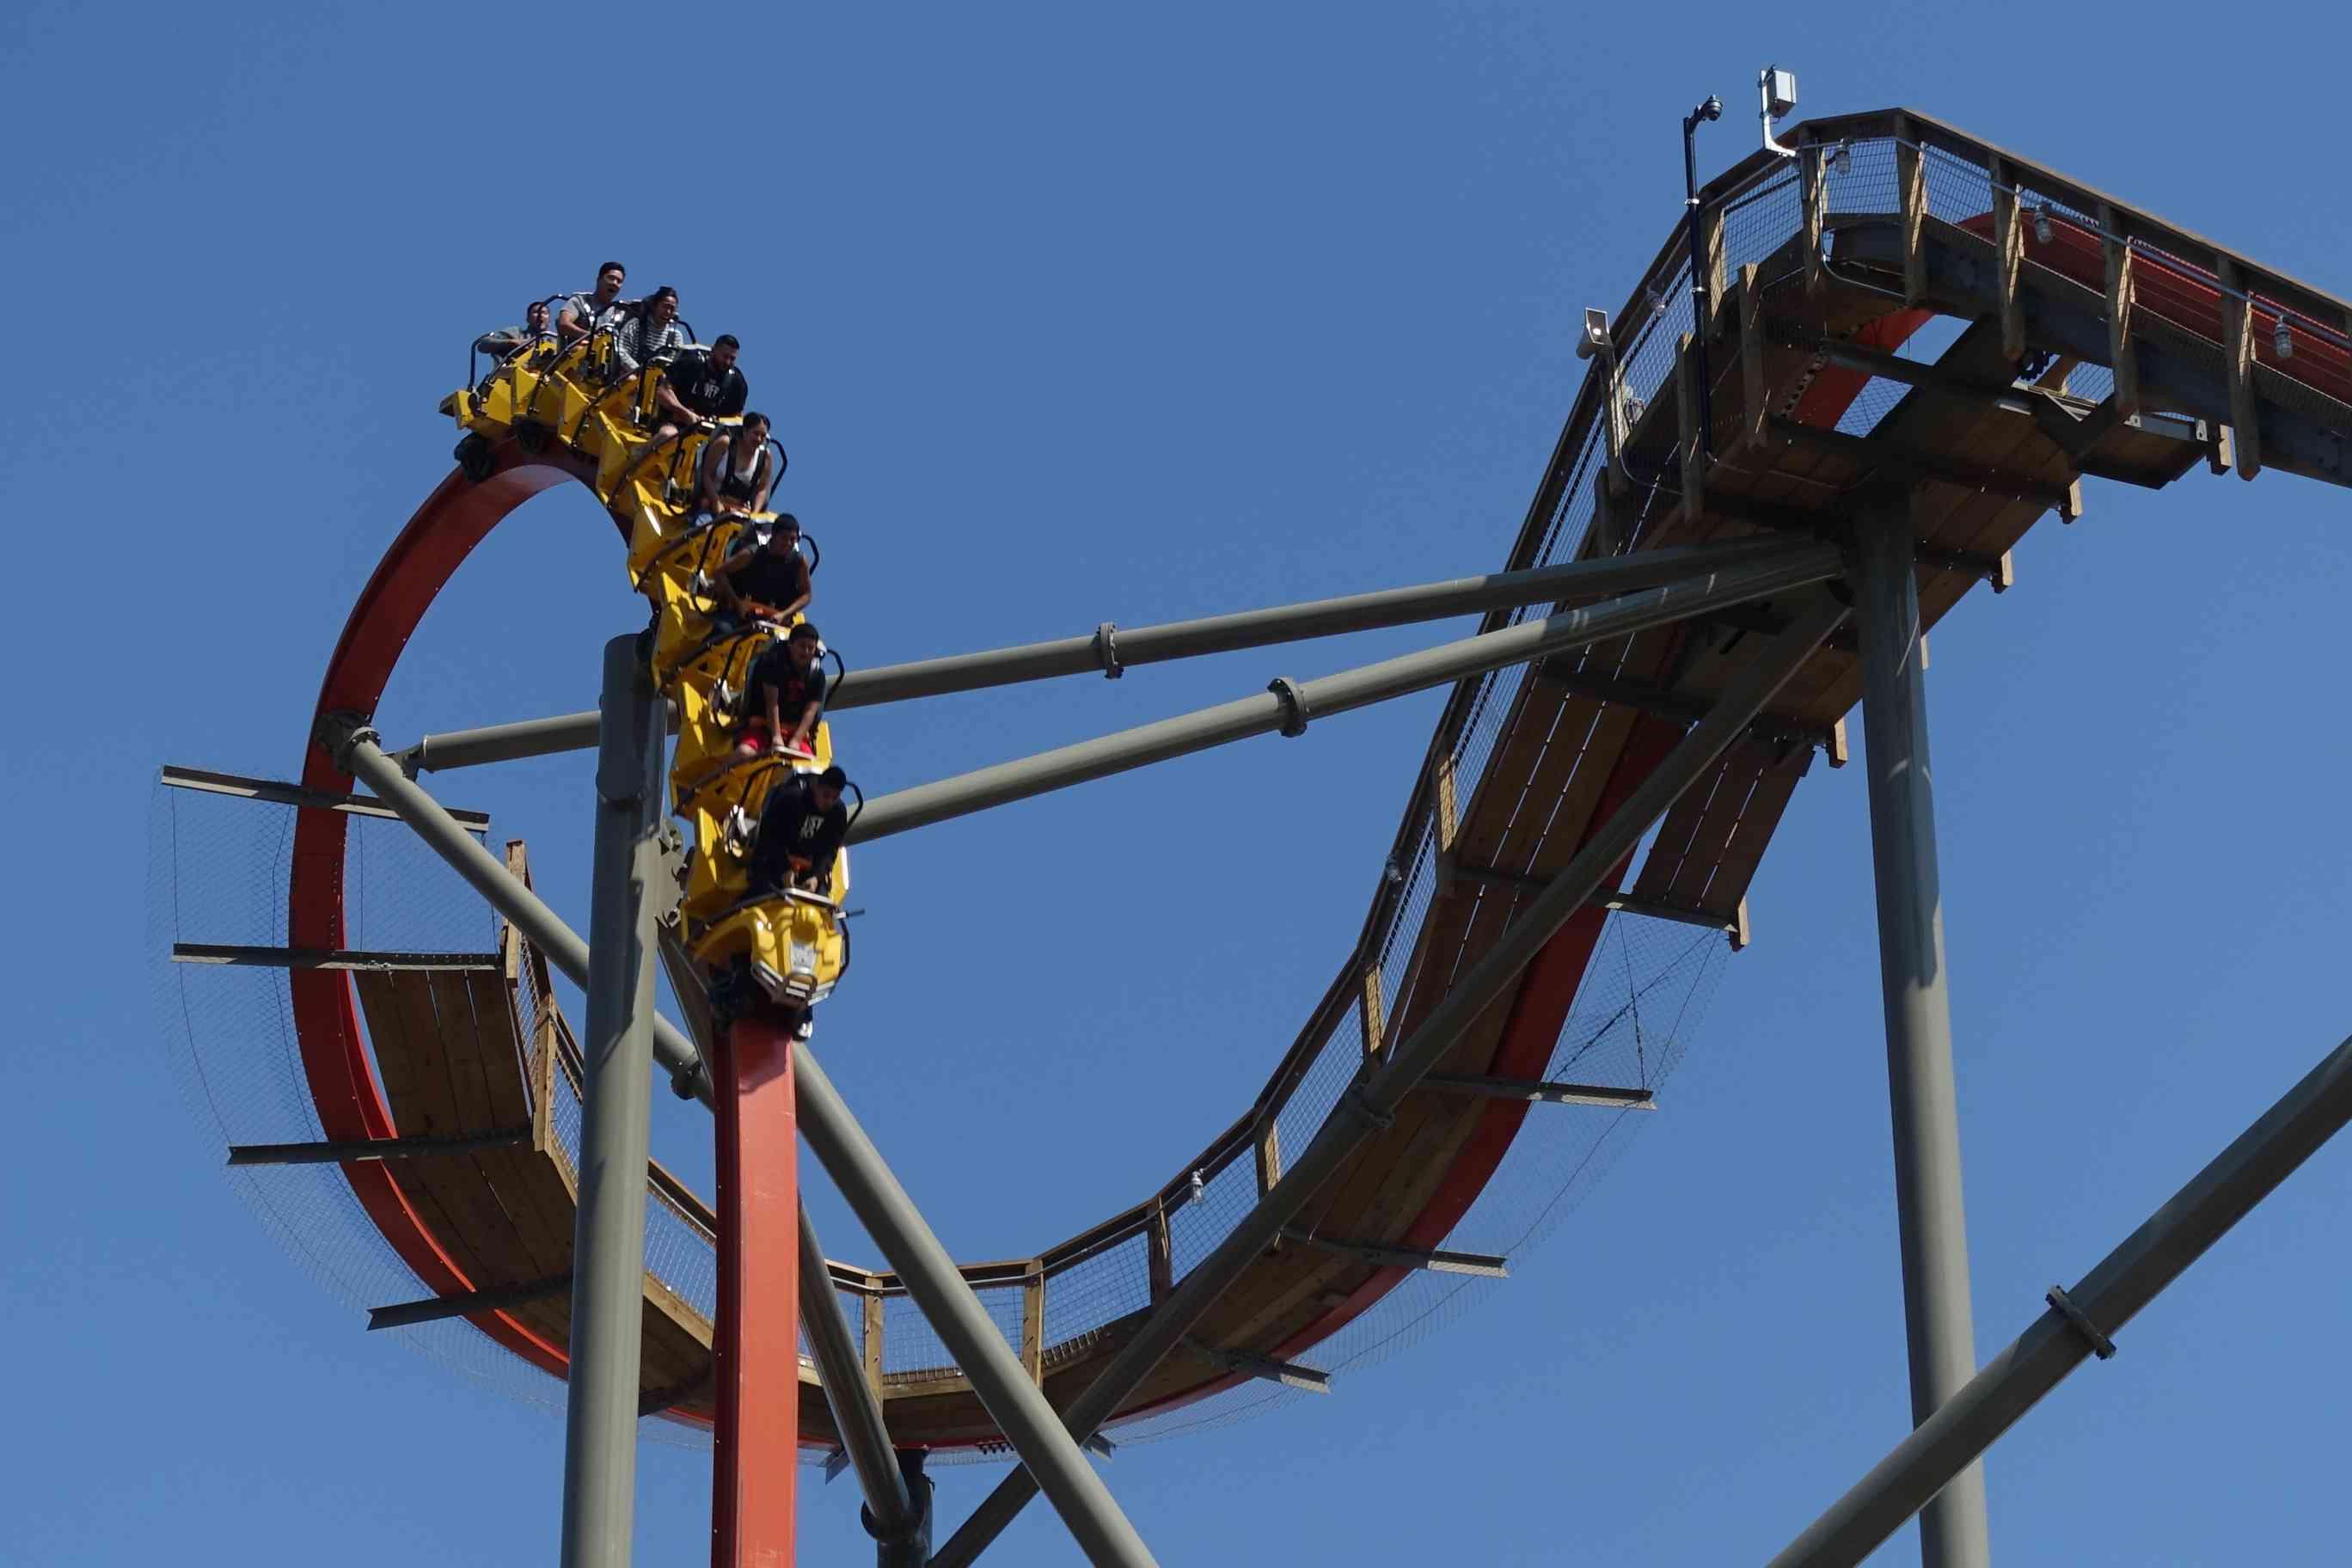 California's Great America RailBlazer roller coaster